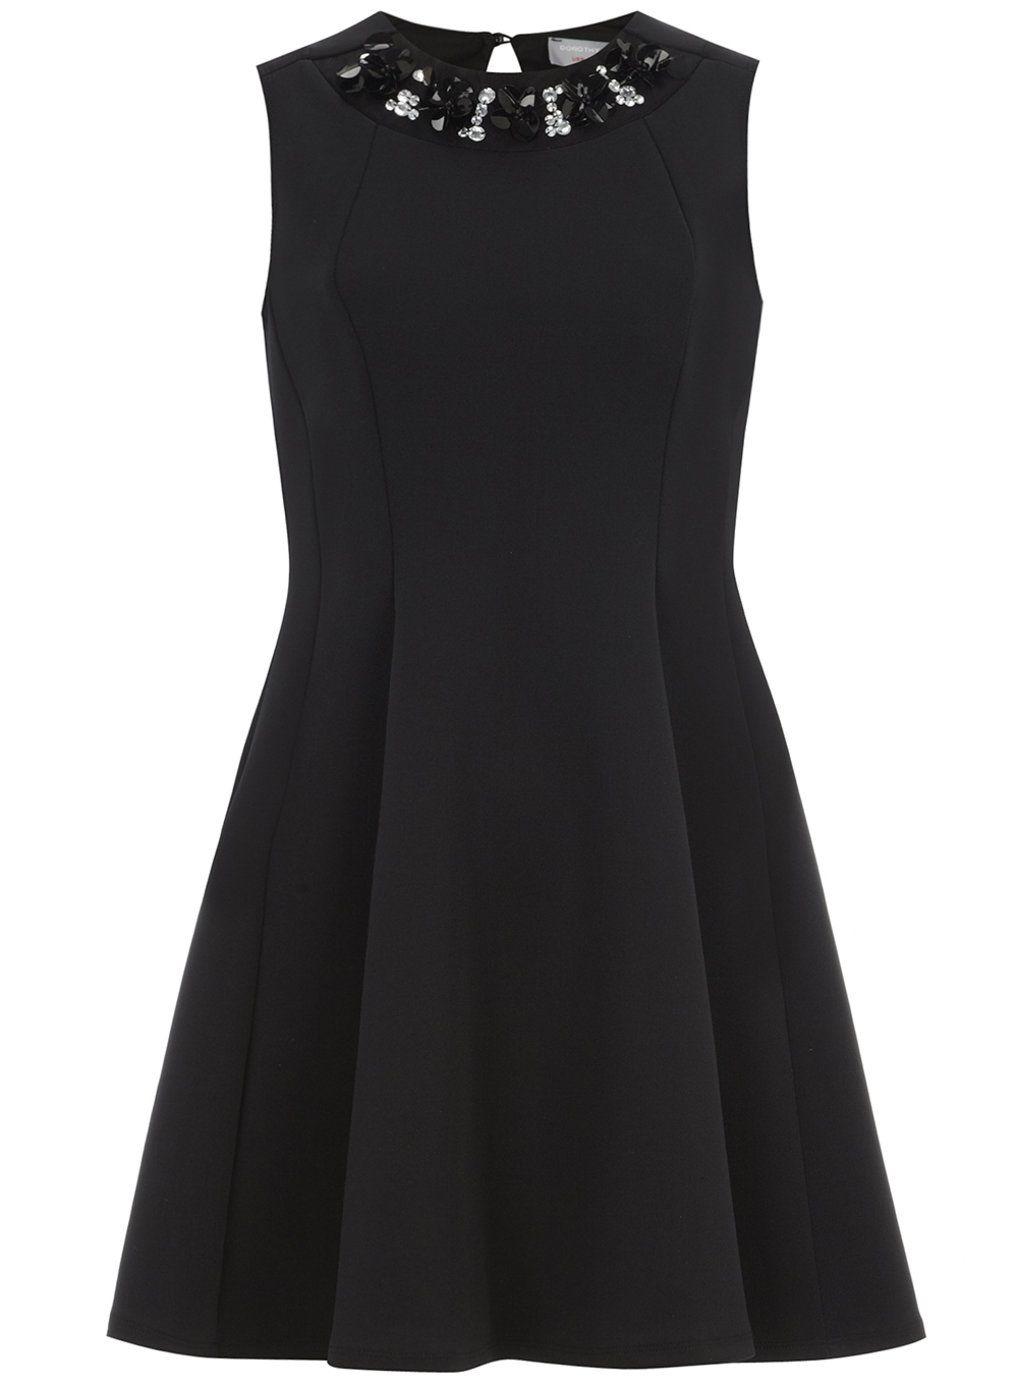 Petite neoprene fit and flare dress